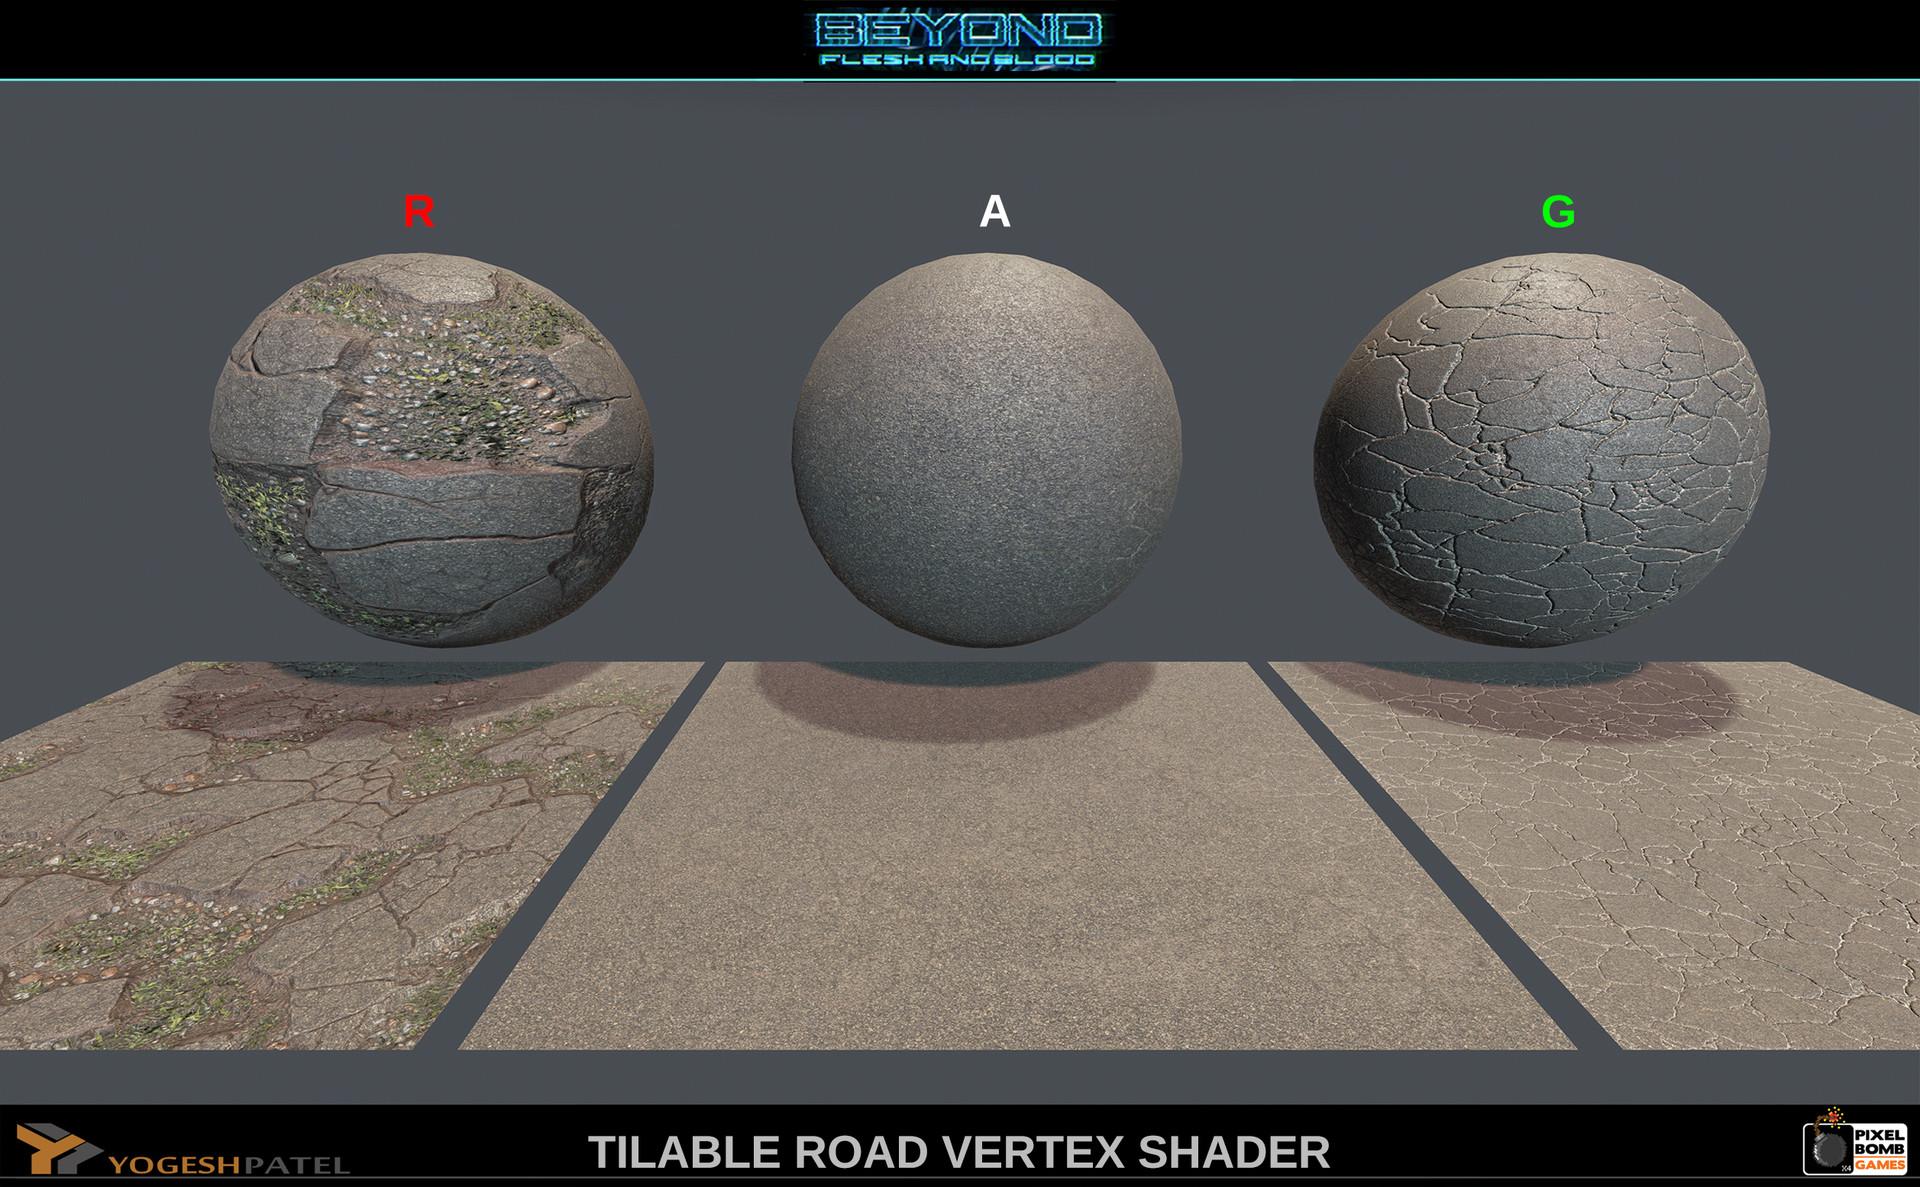 Yogi Patel - Pixelbomb Games Professional Work